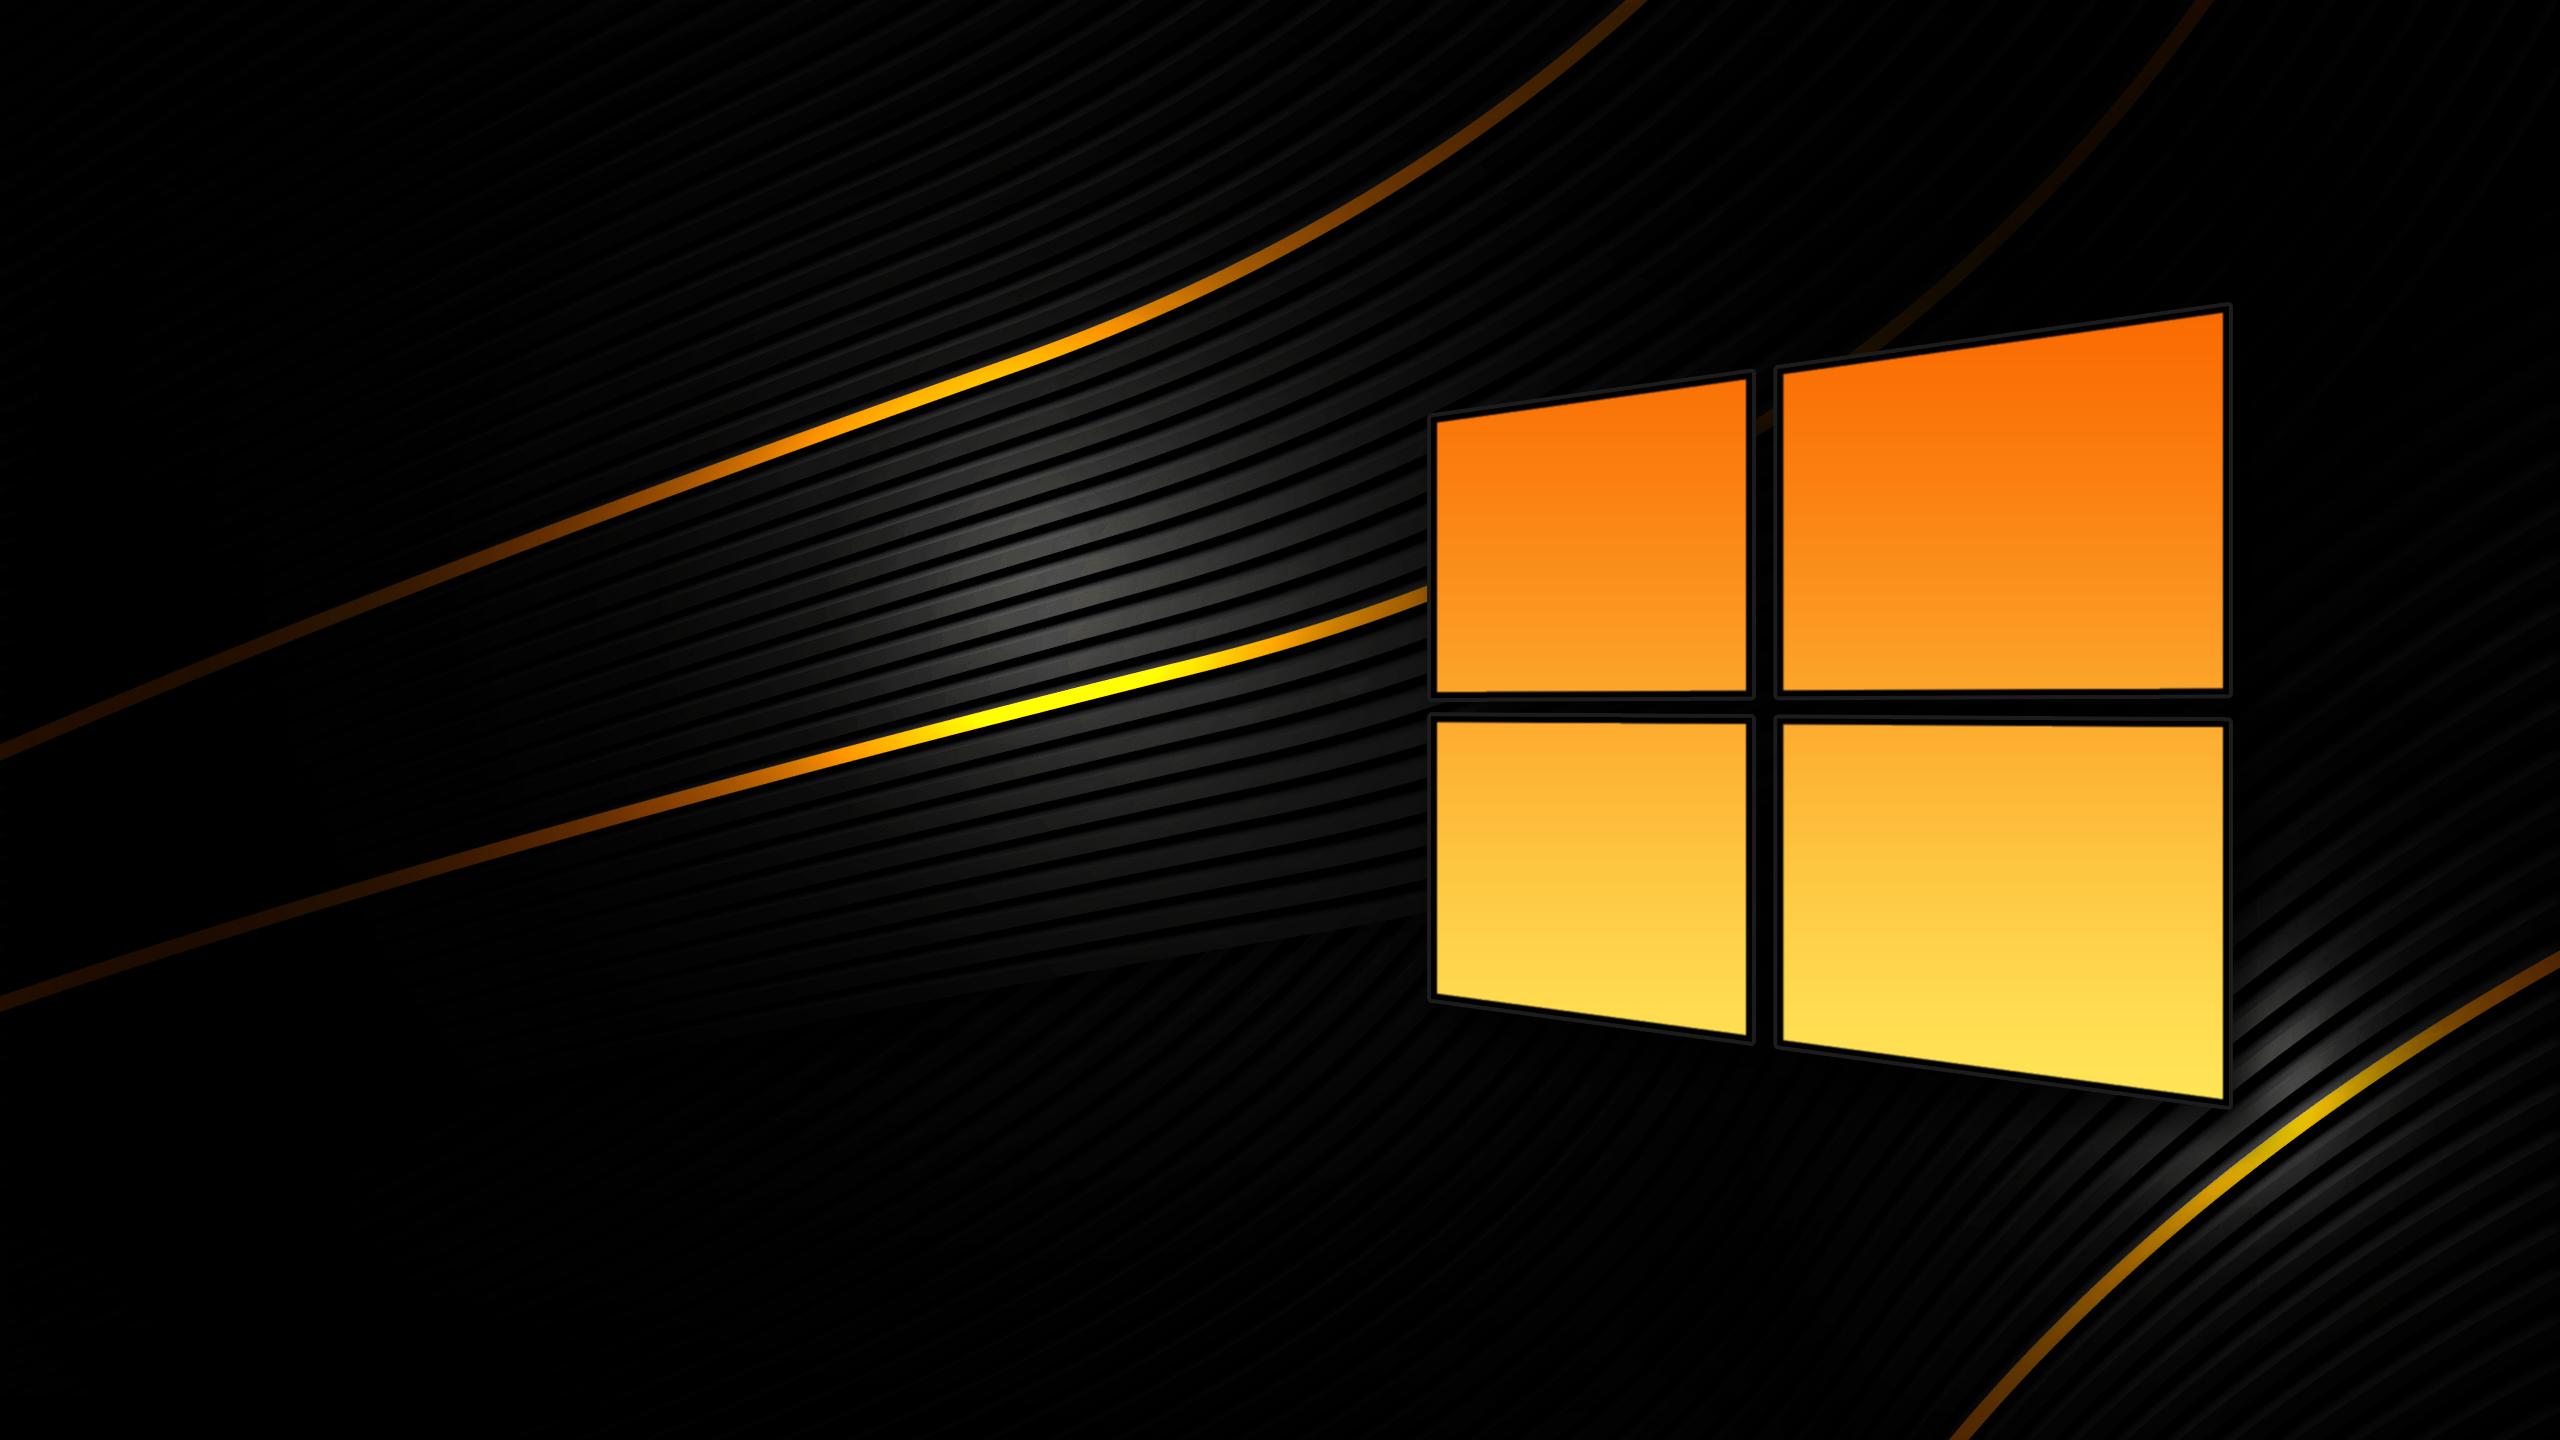 Nice wallpapers Windows 2560x1440px